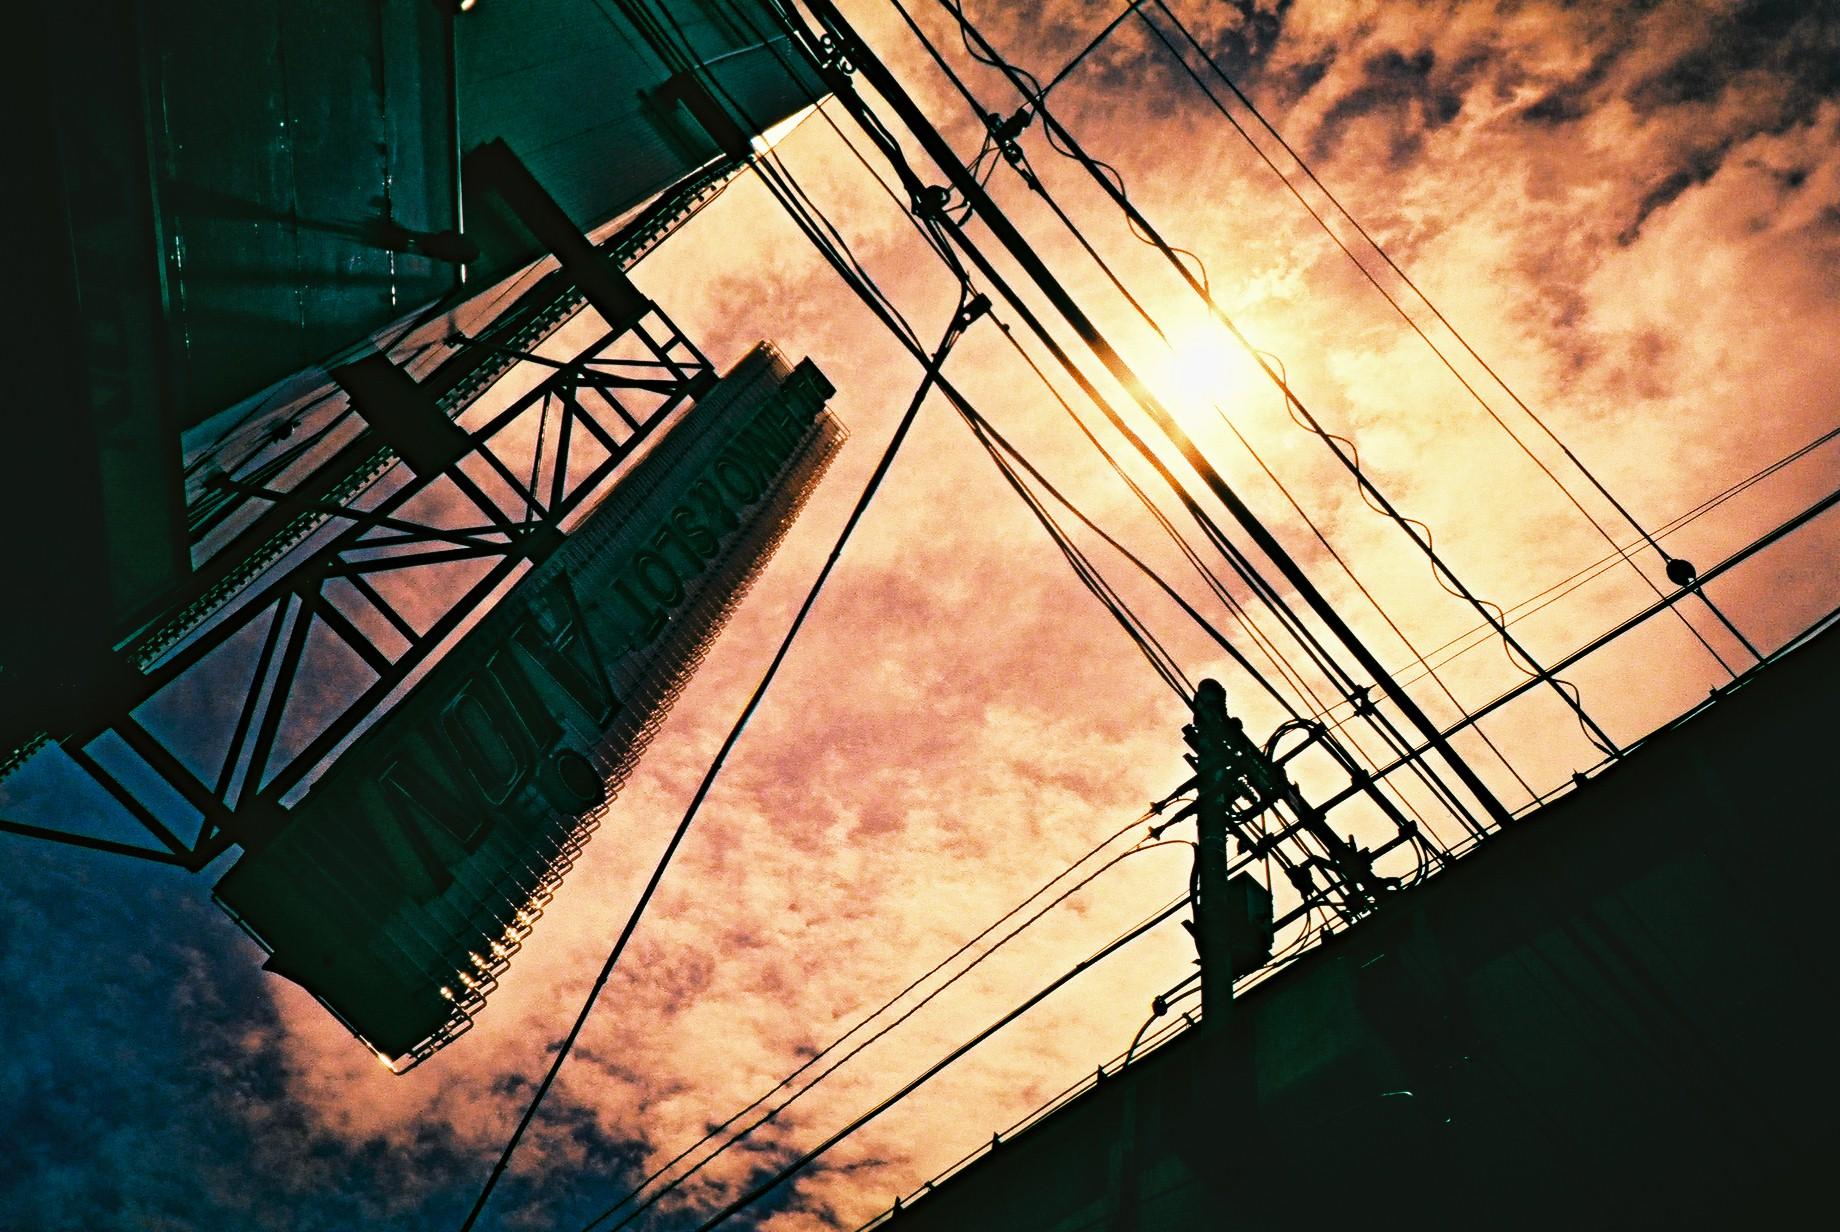 Wallpaper : sky, film, Japan, 35MM, Tokyo, lomo, lca